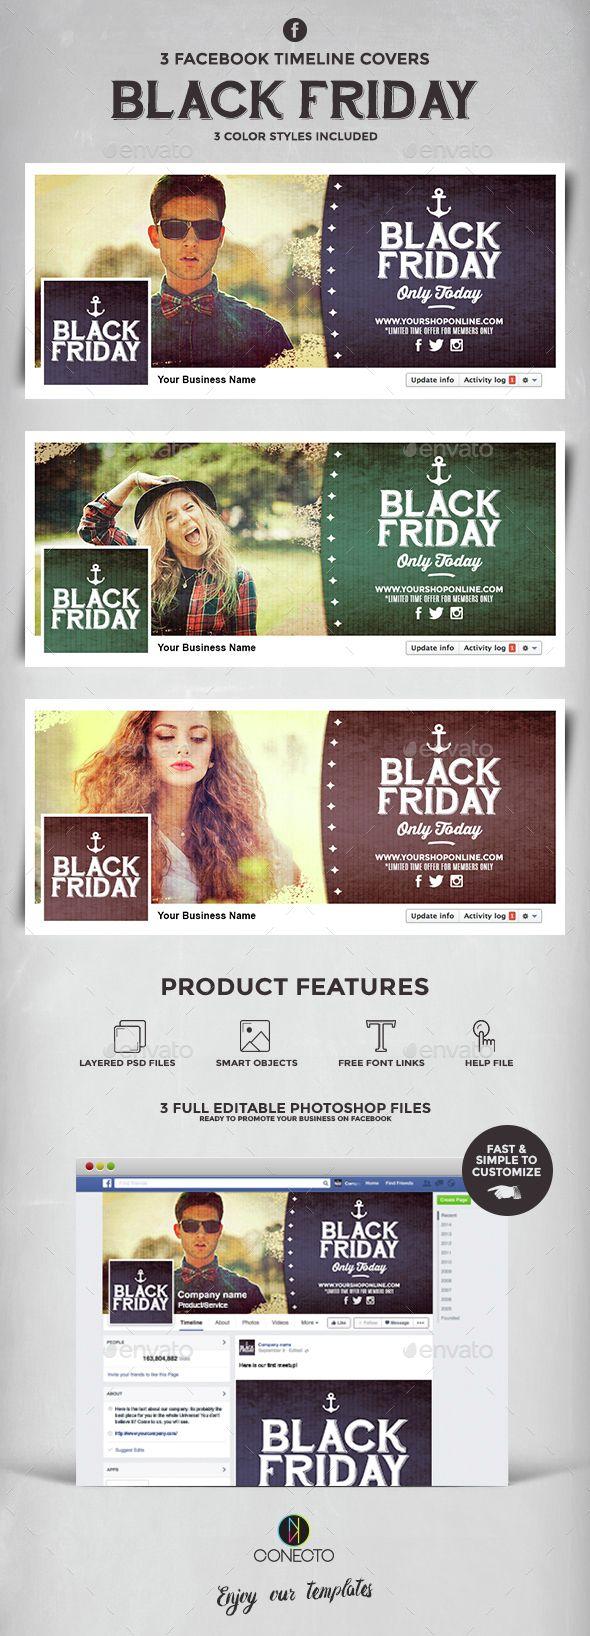 Retro Facebook Covers - Black Friday